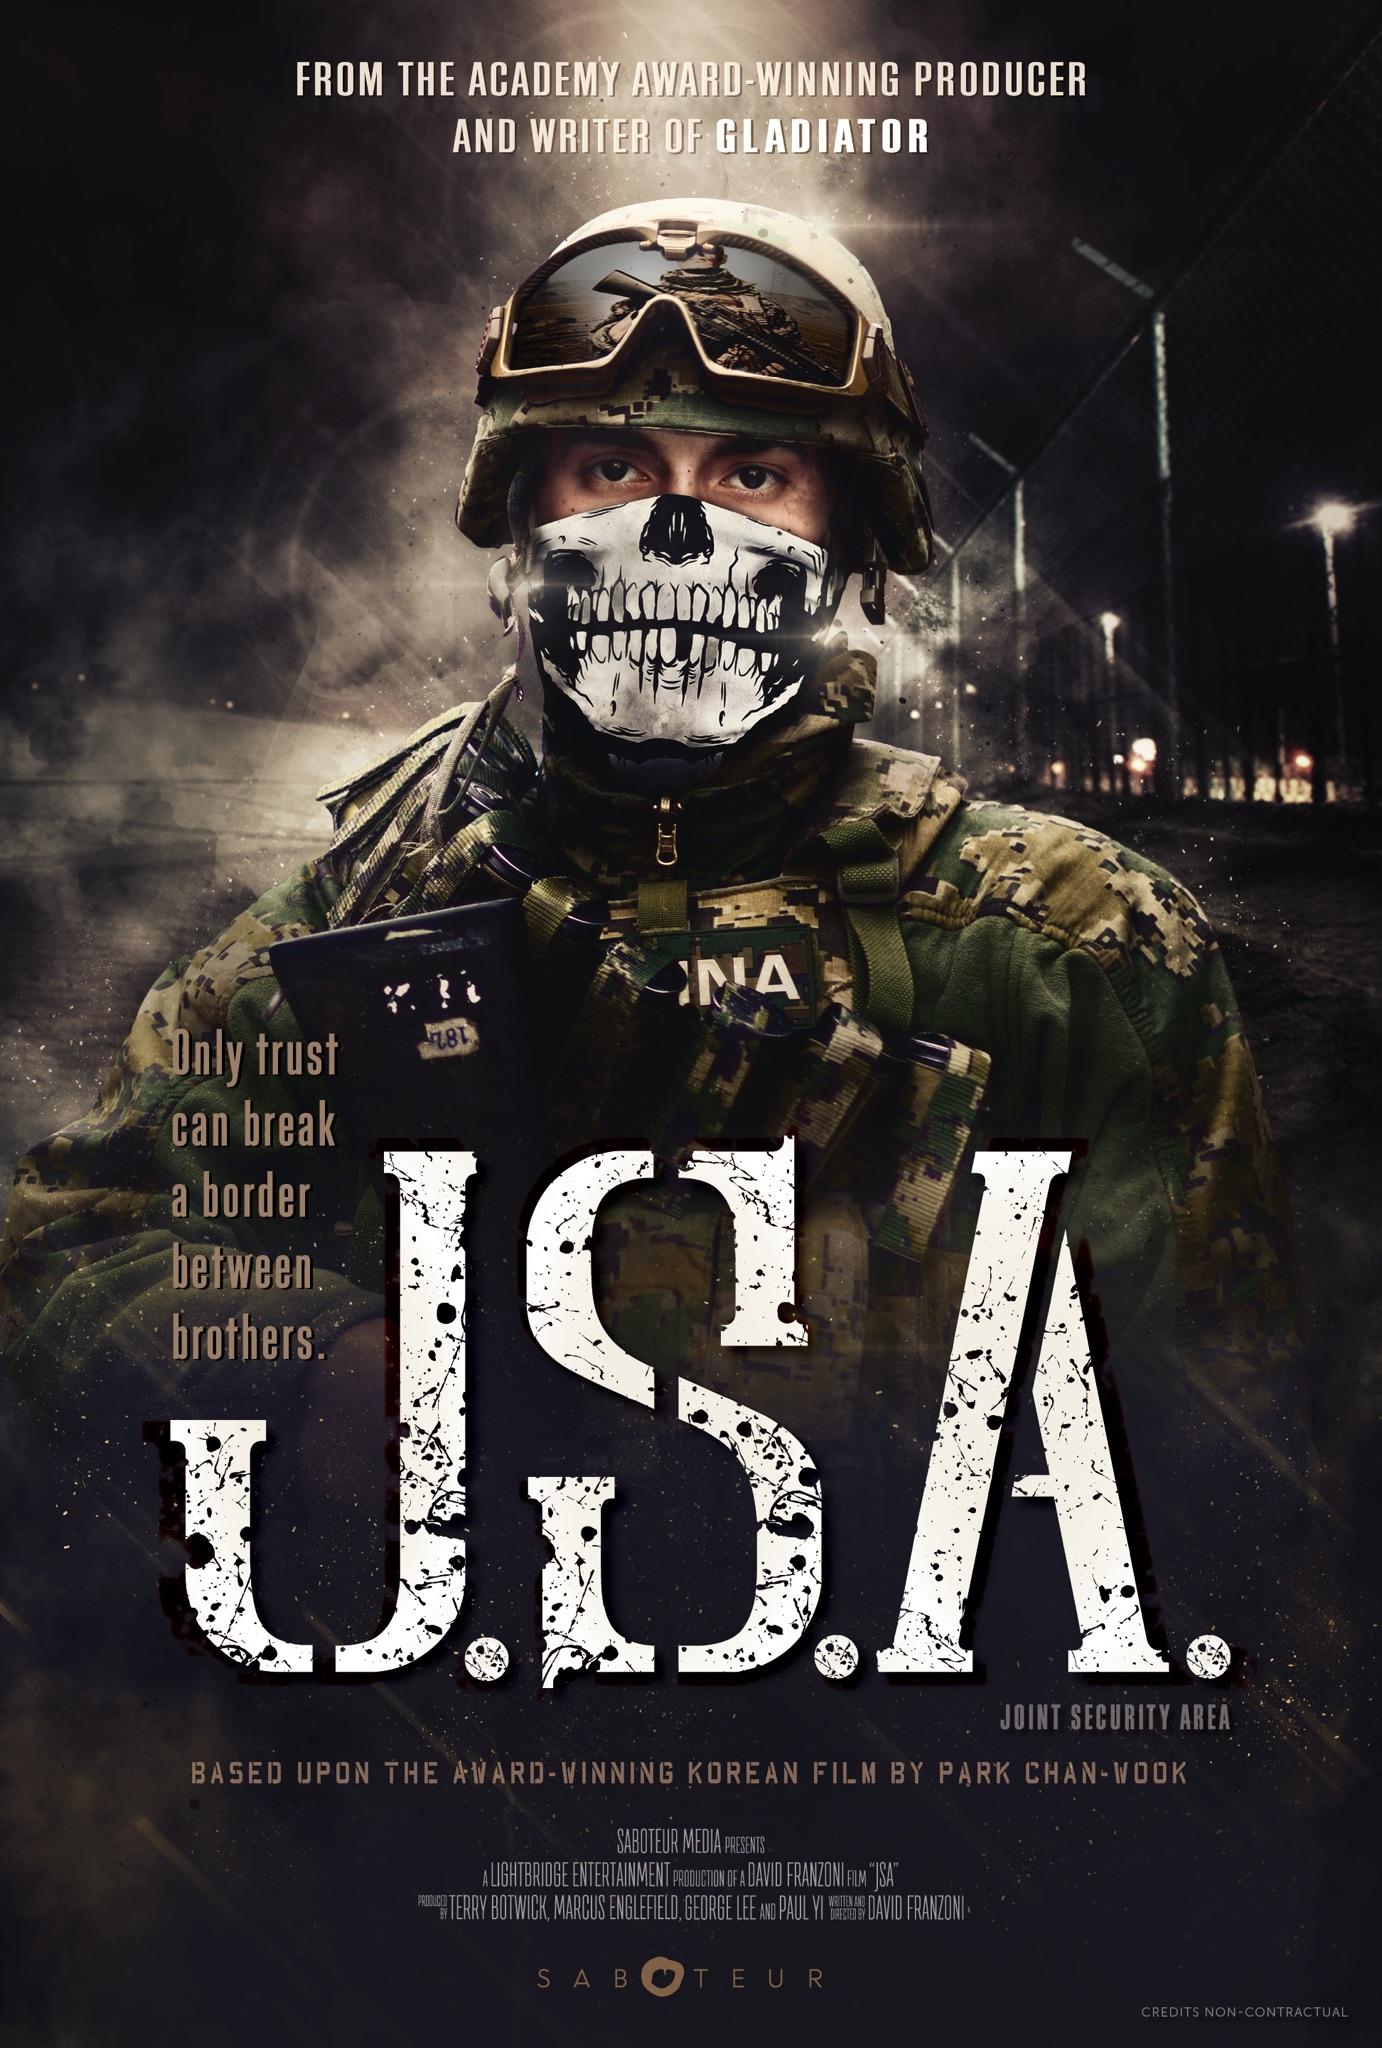 JSA Berlin poster.jpg.jpeg